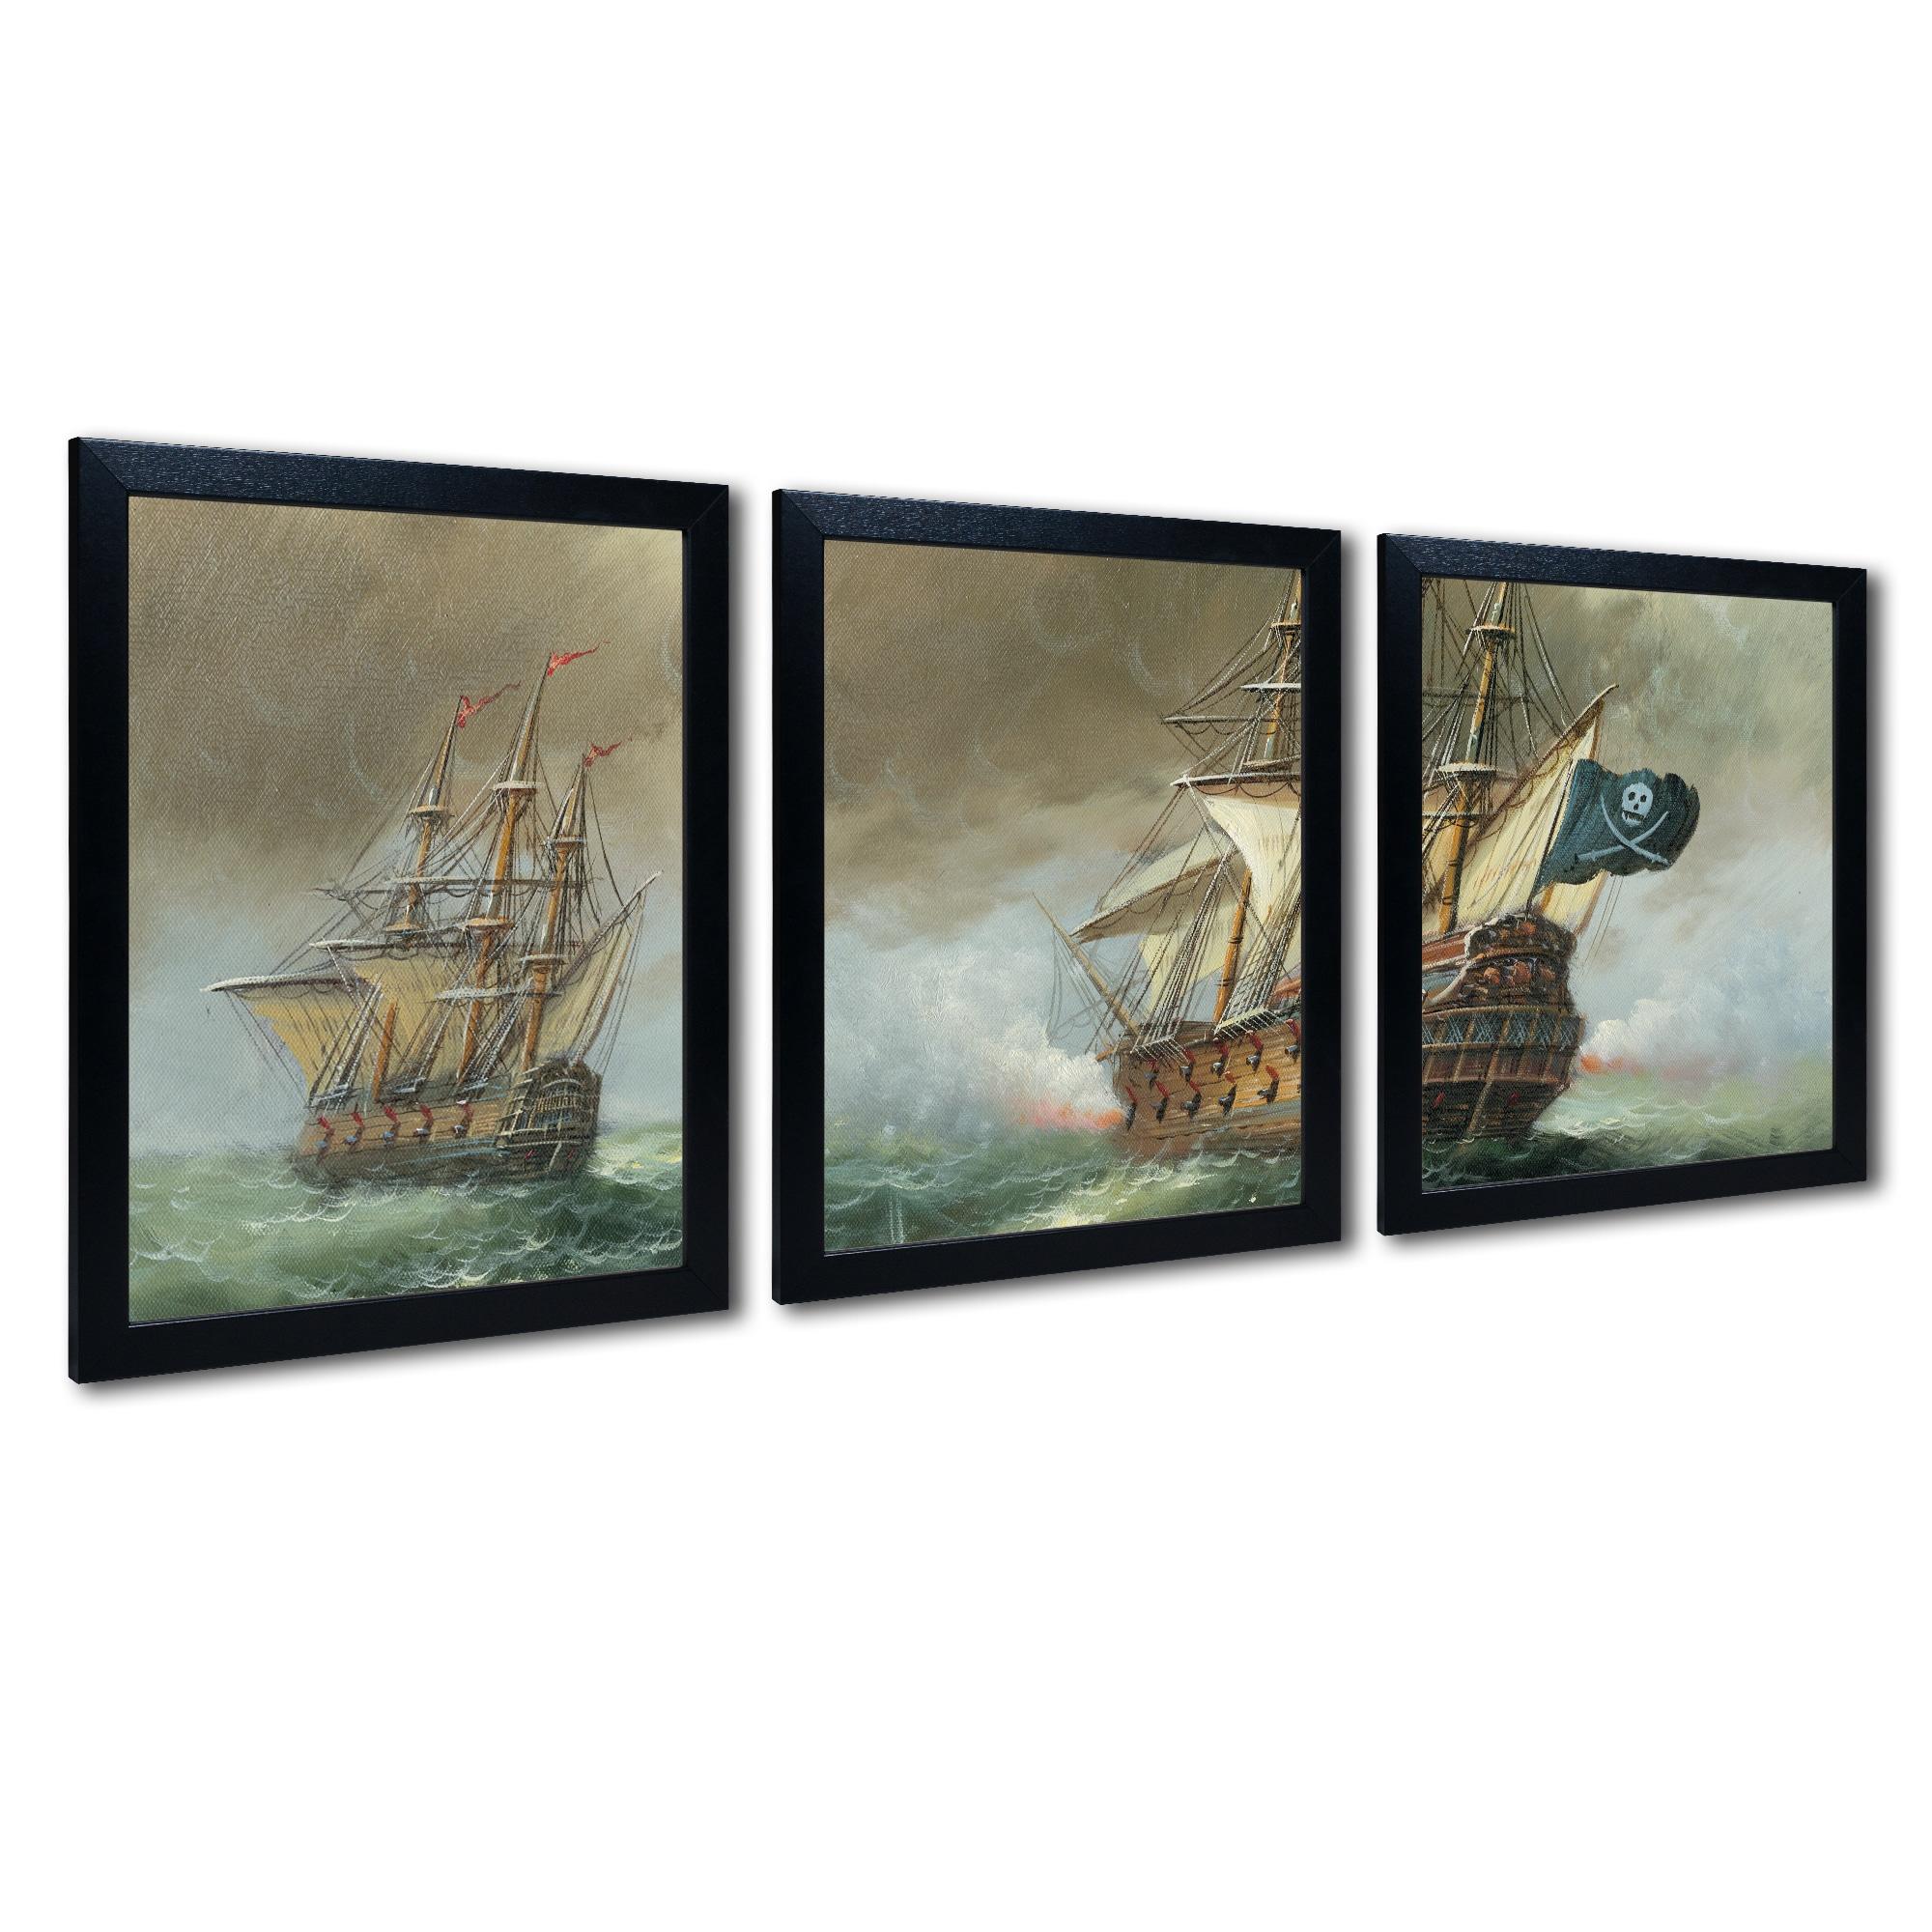 Nice 16x20 Frame For Canvas Motif - Framed Art Ideas - roadofriches.com